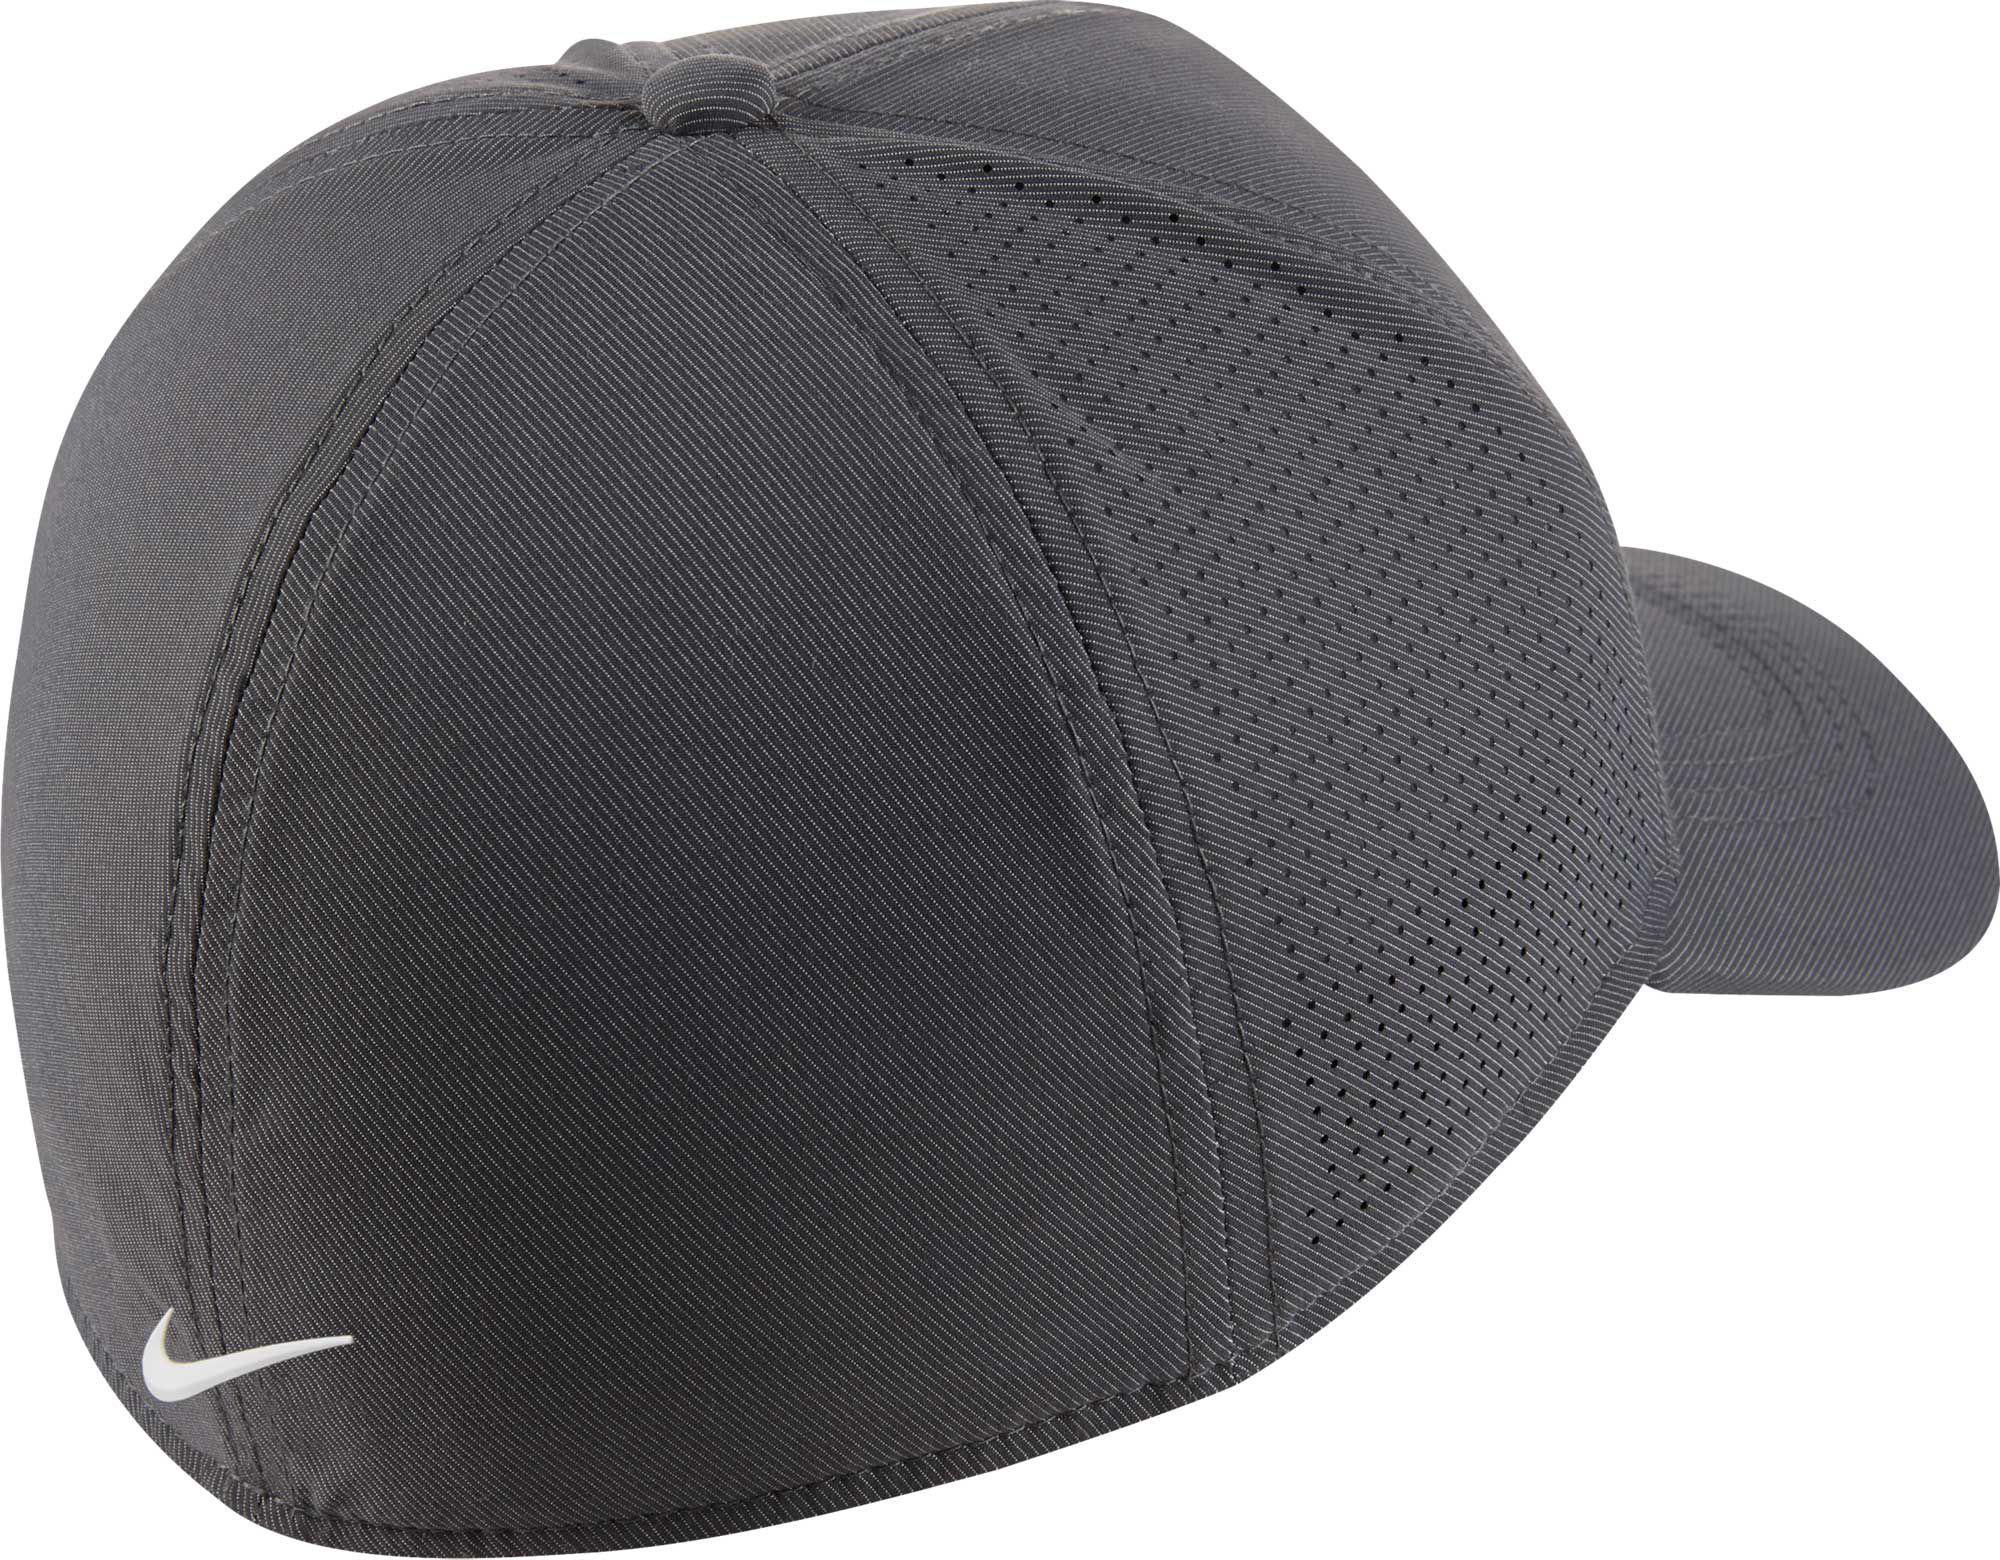 c7b27a37666 Nike Aerobill Perforated Golf Hat  Custom nike golf caps hats ...